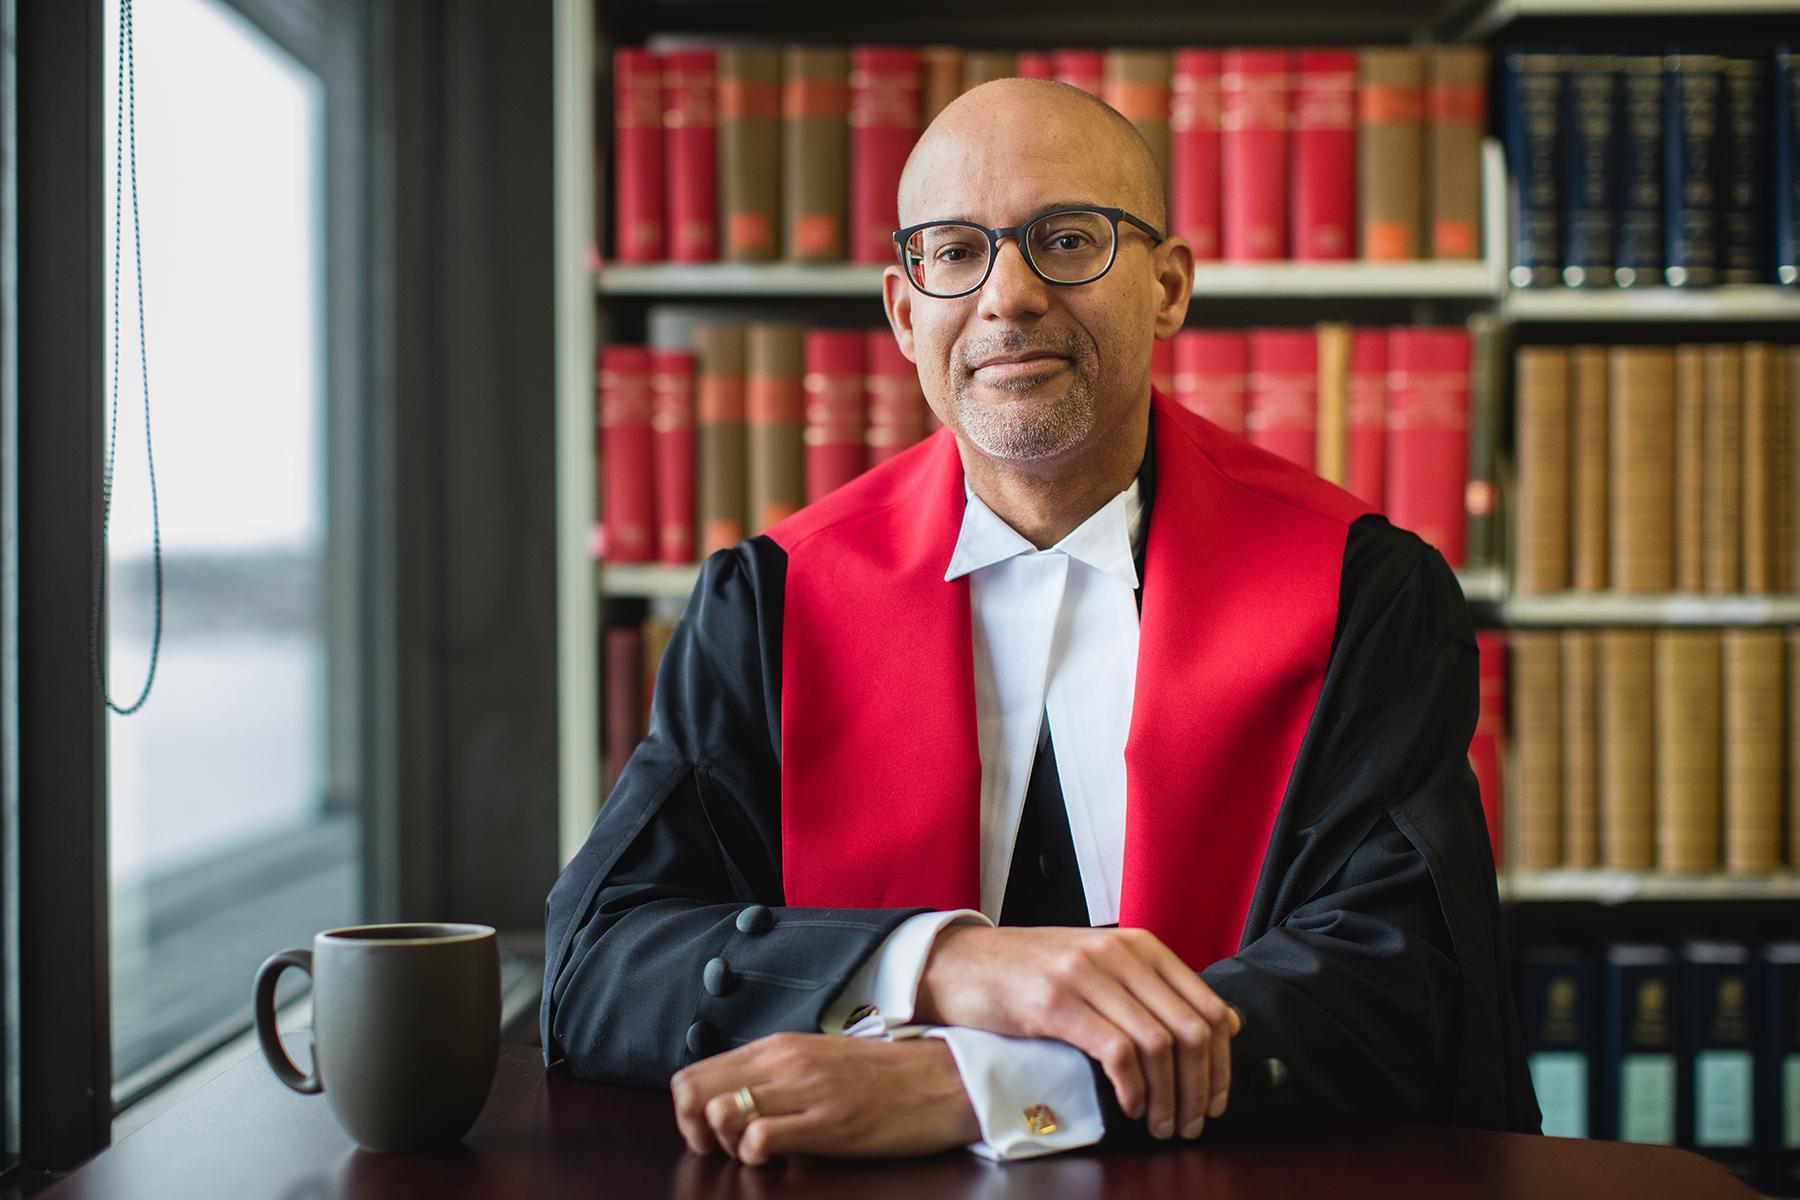 Justice John Bodurtha